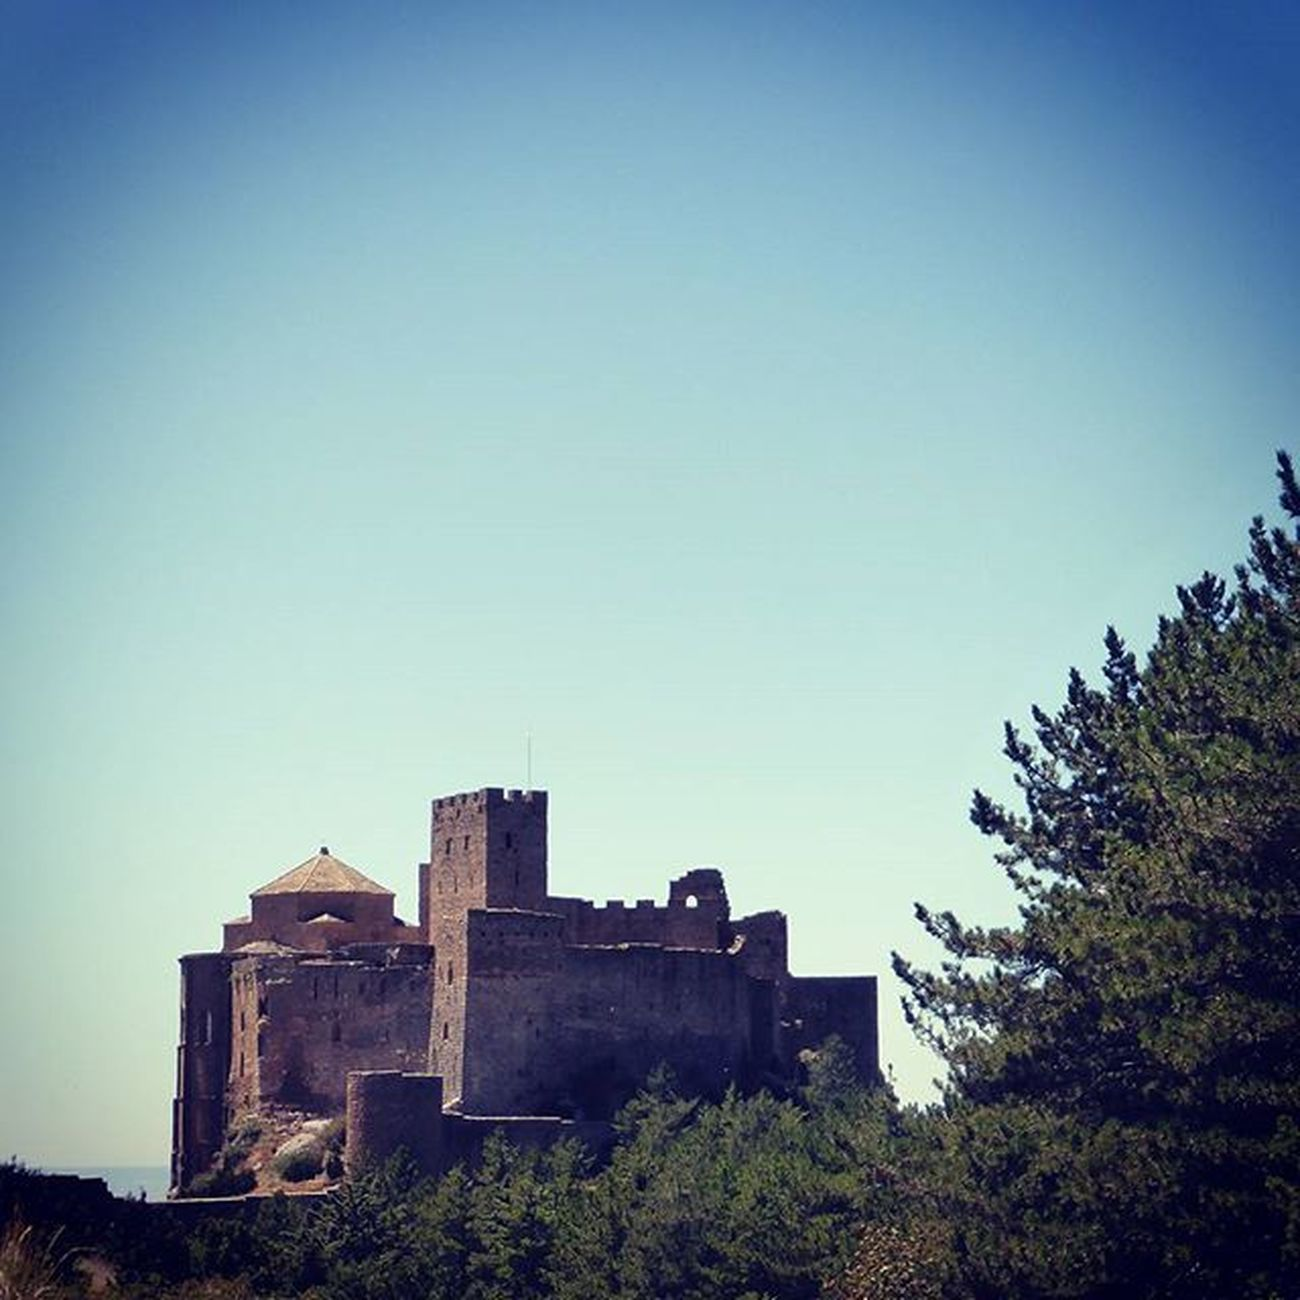 Huescalamagia Loarre Skylovers Igersaragon igerszgz instazgz castle